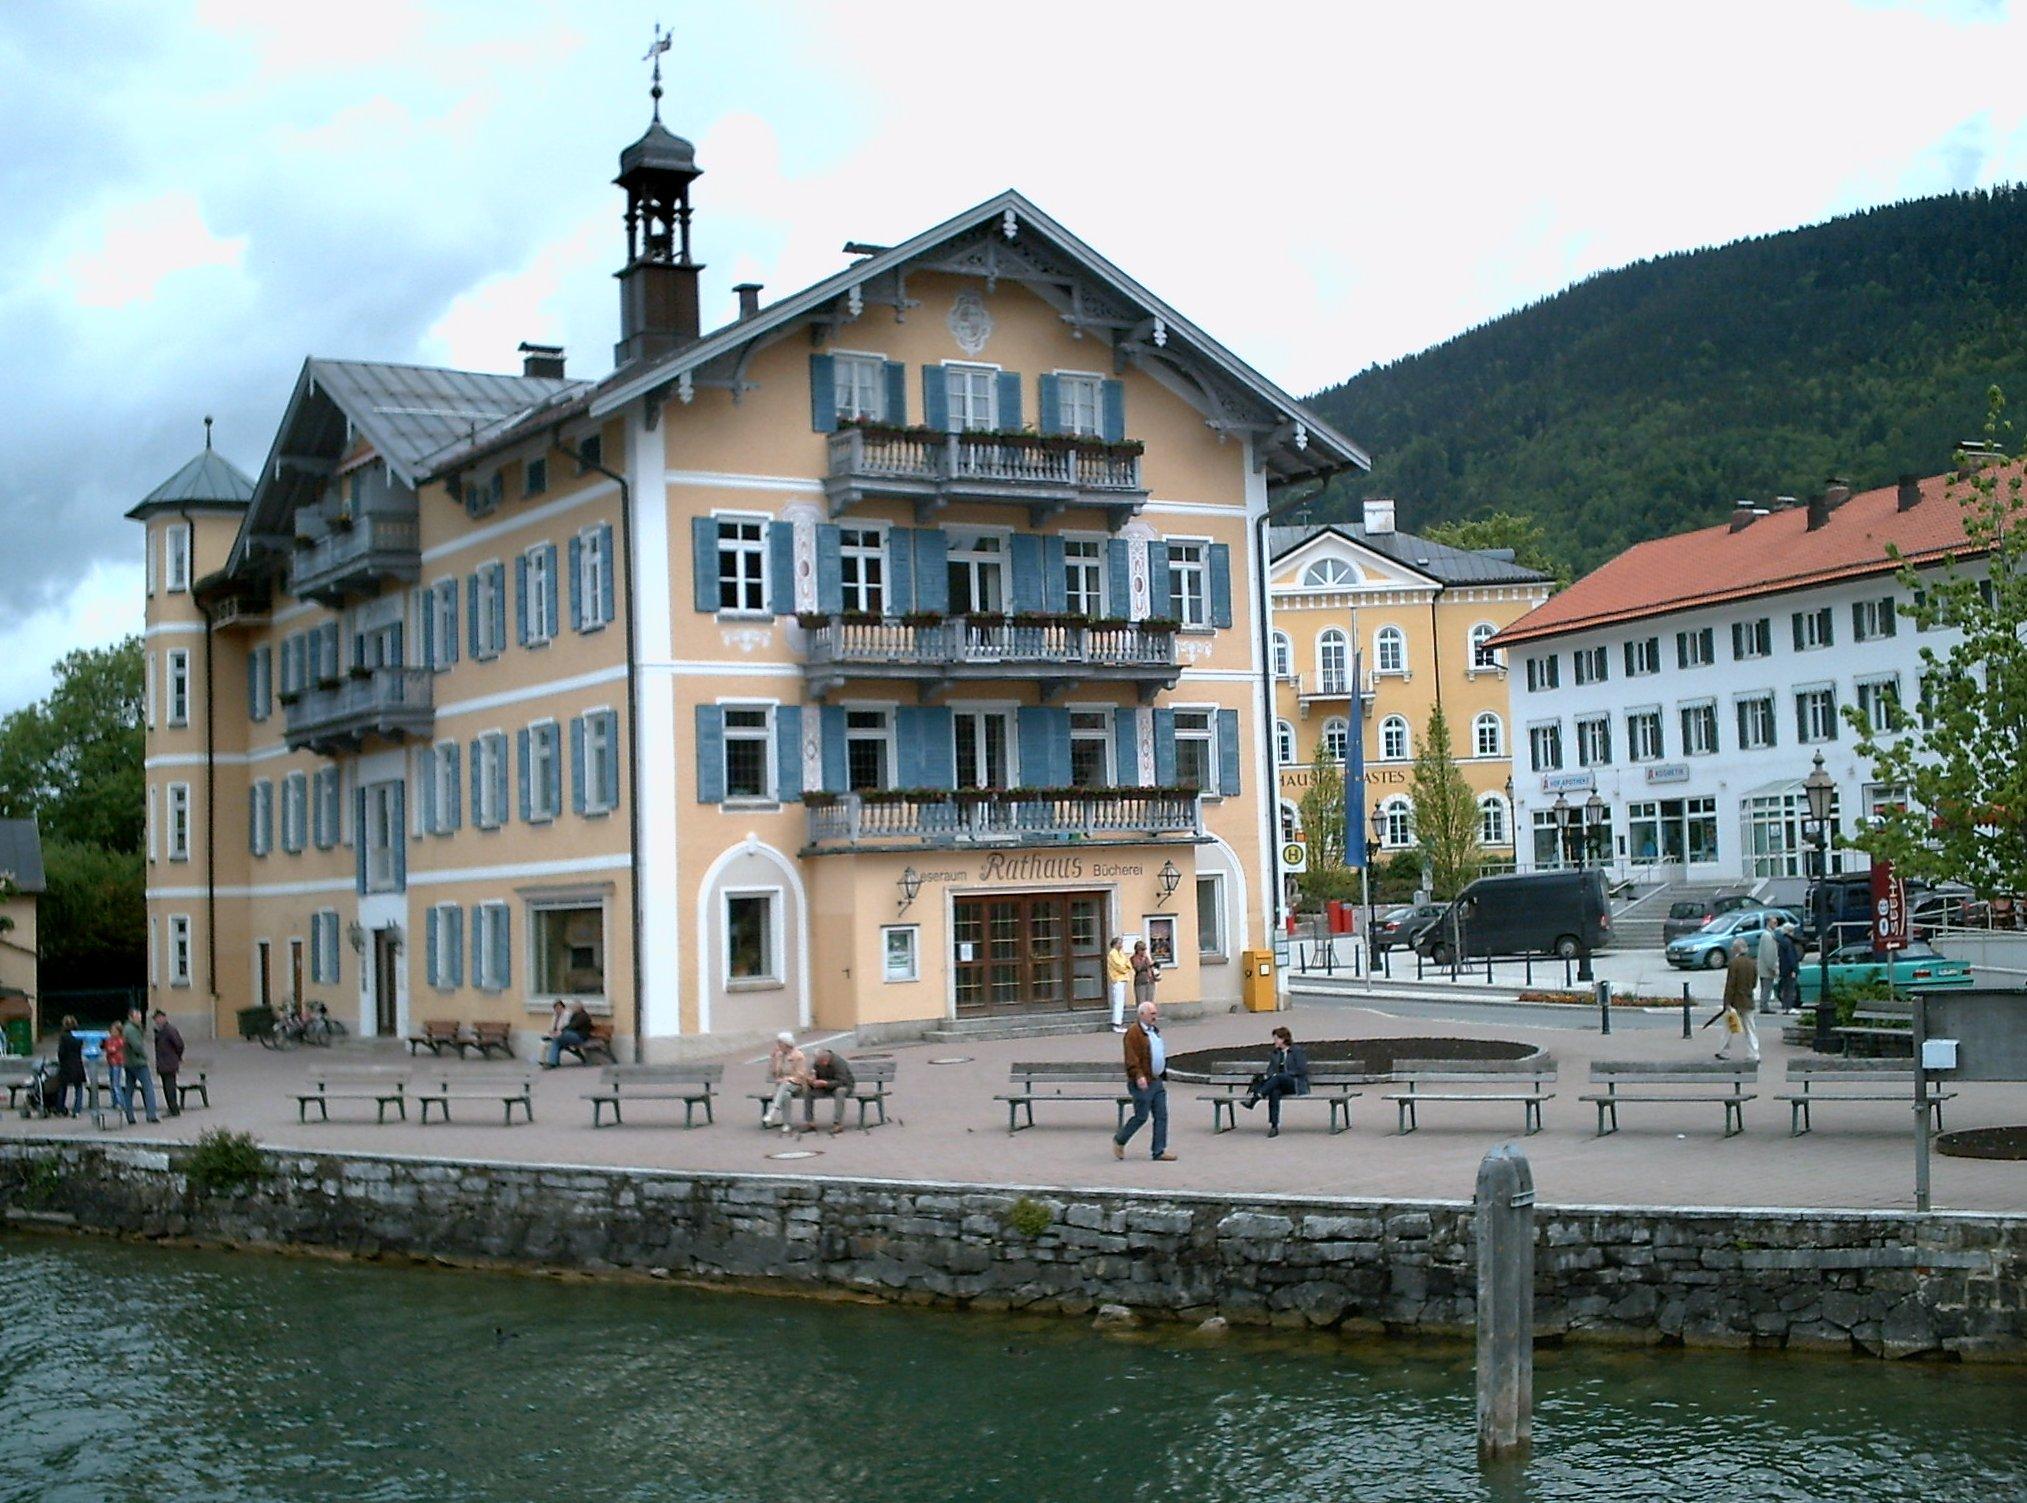 megasesso roten TegernseeВ(Bavaria)